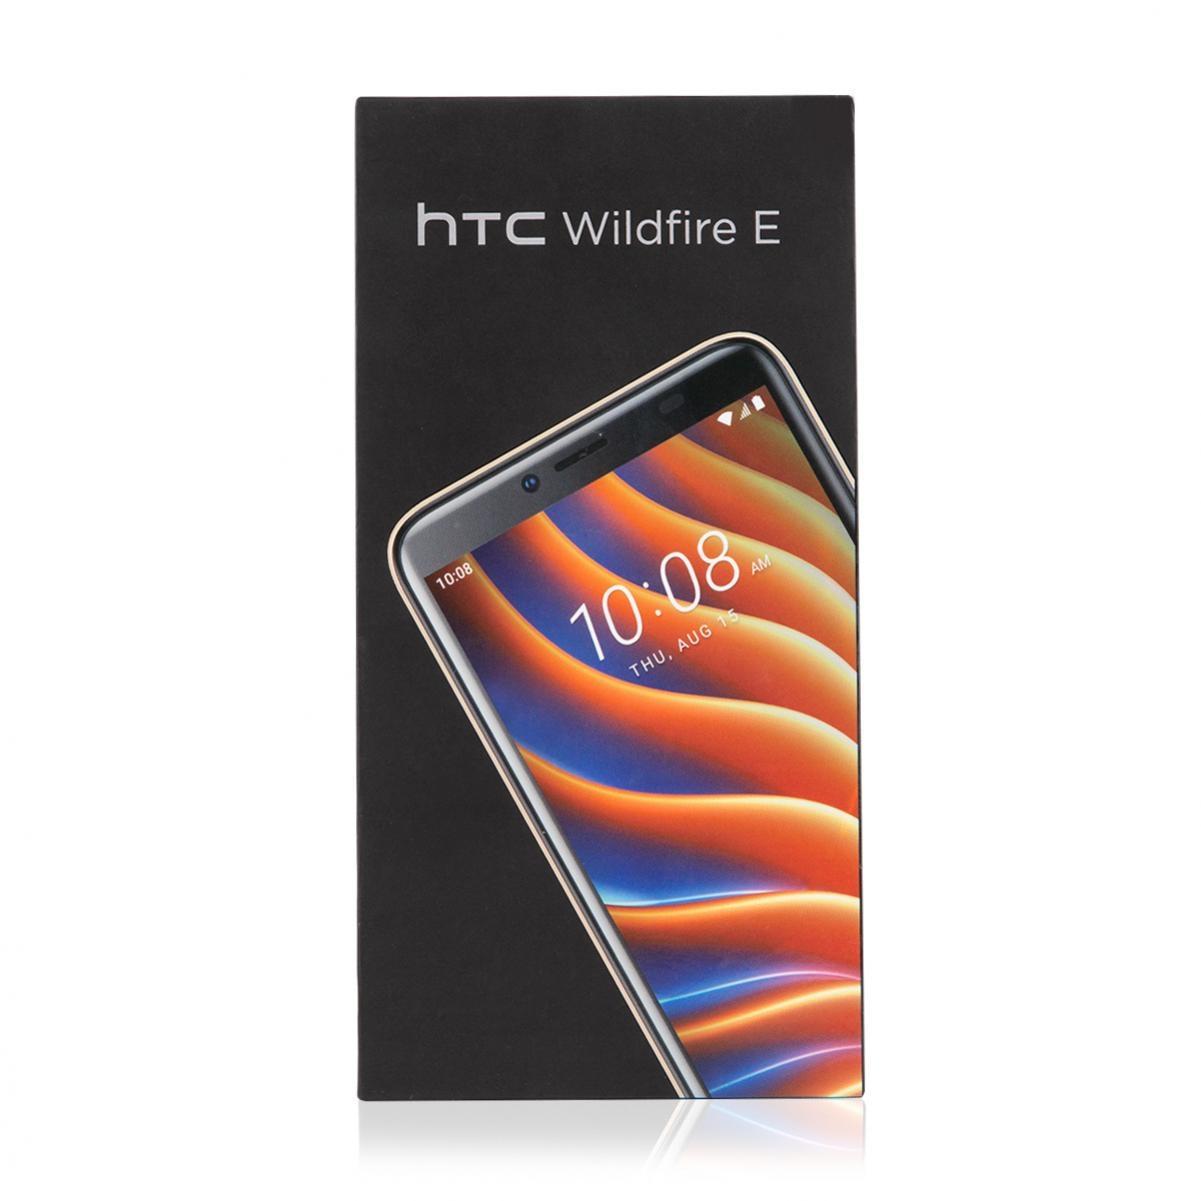 Cупербюджетный HTC Wildfire E анонсирован через телемагазин4